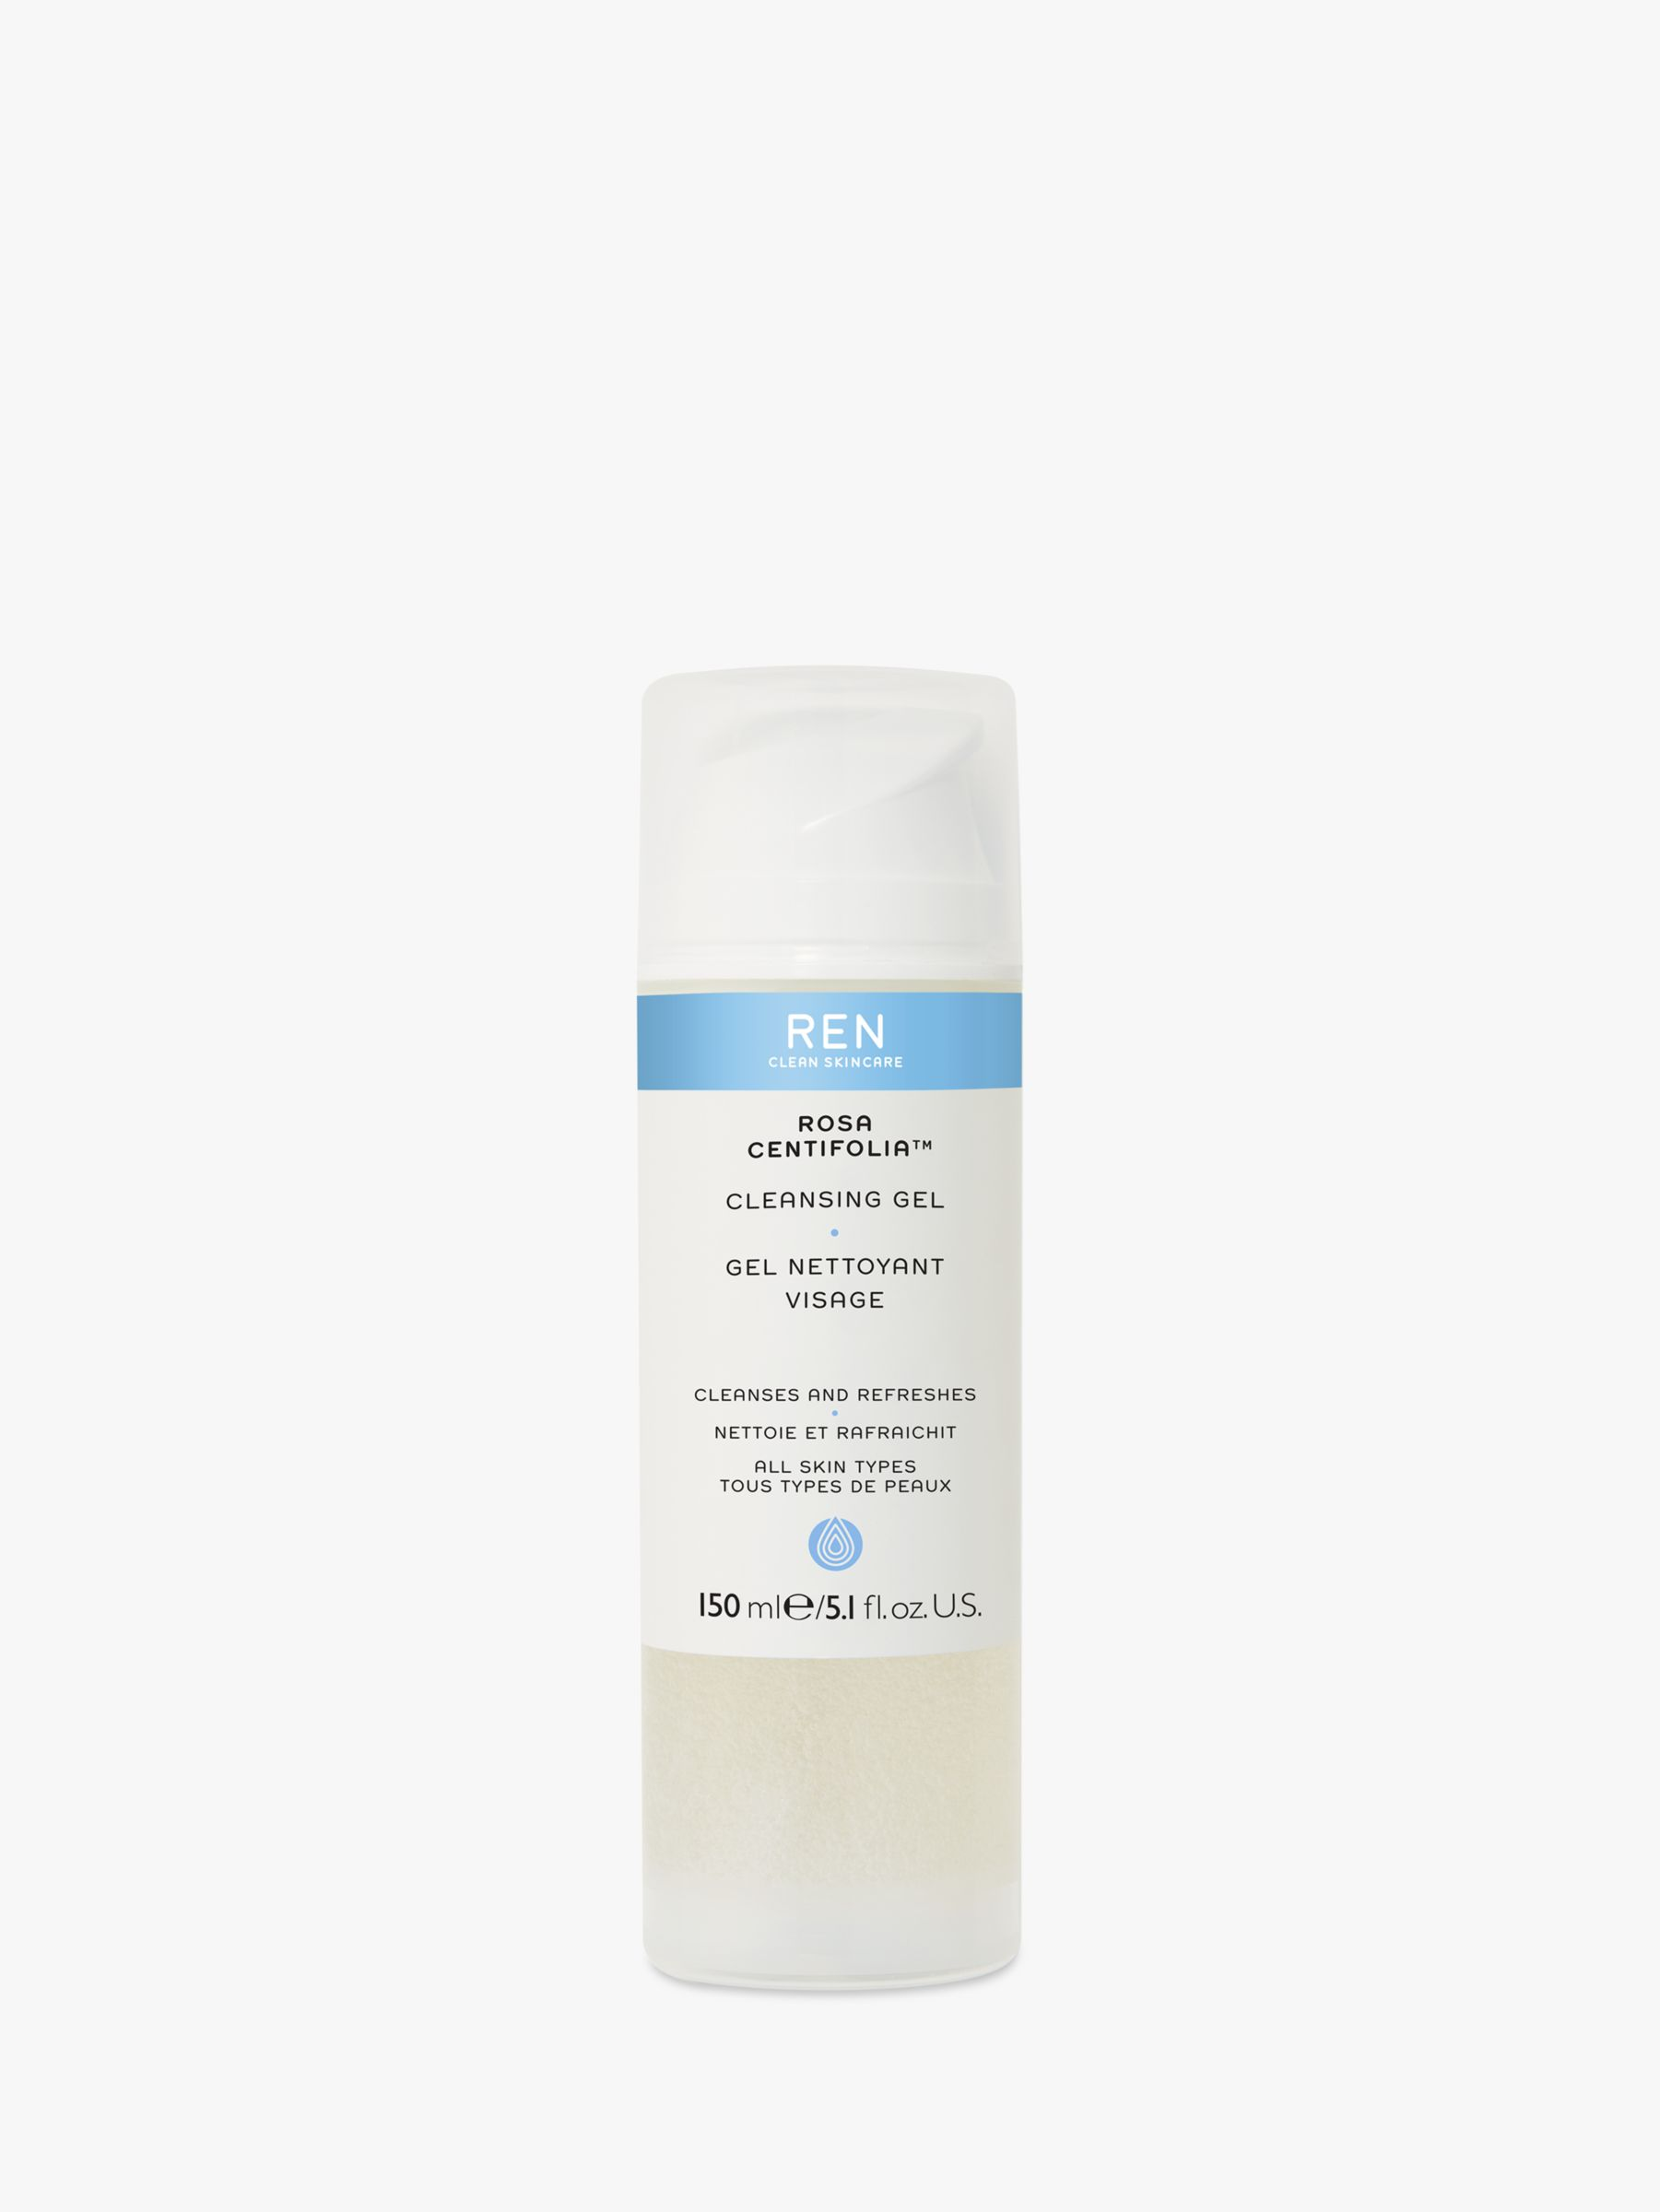 REN REN Rosa Centifolia™ Cleansing Gel, 150ml